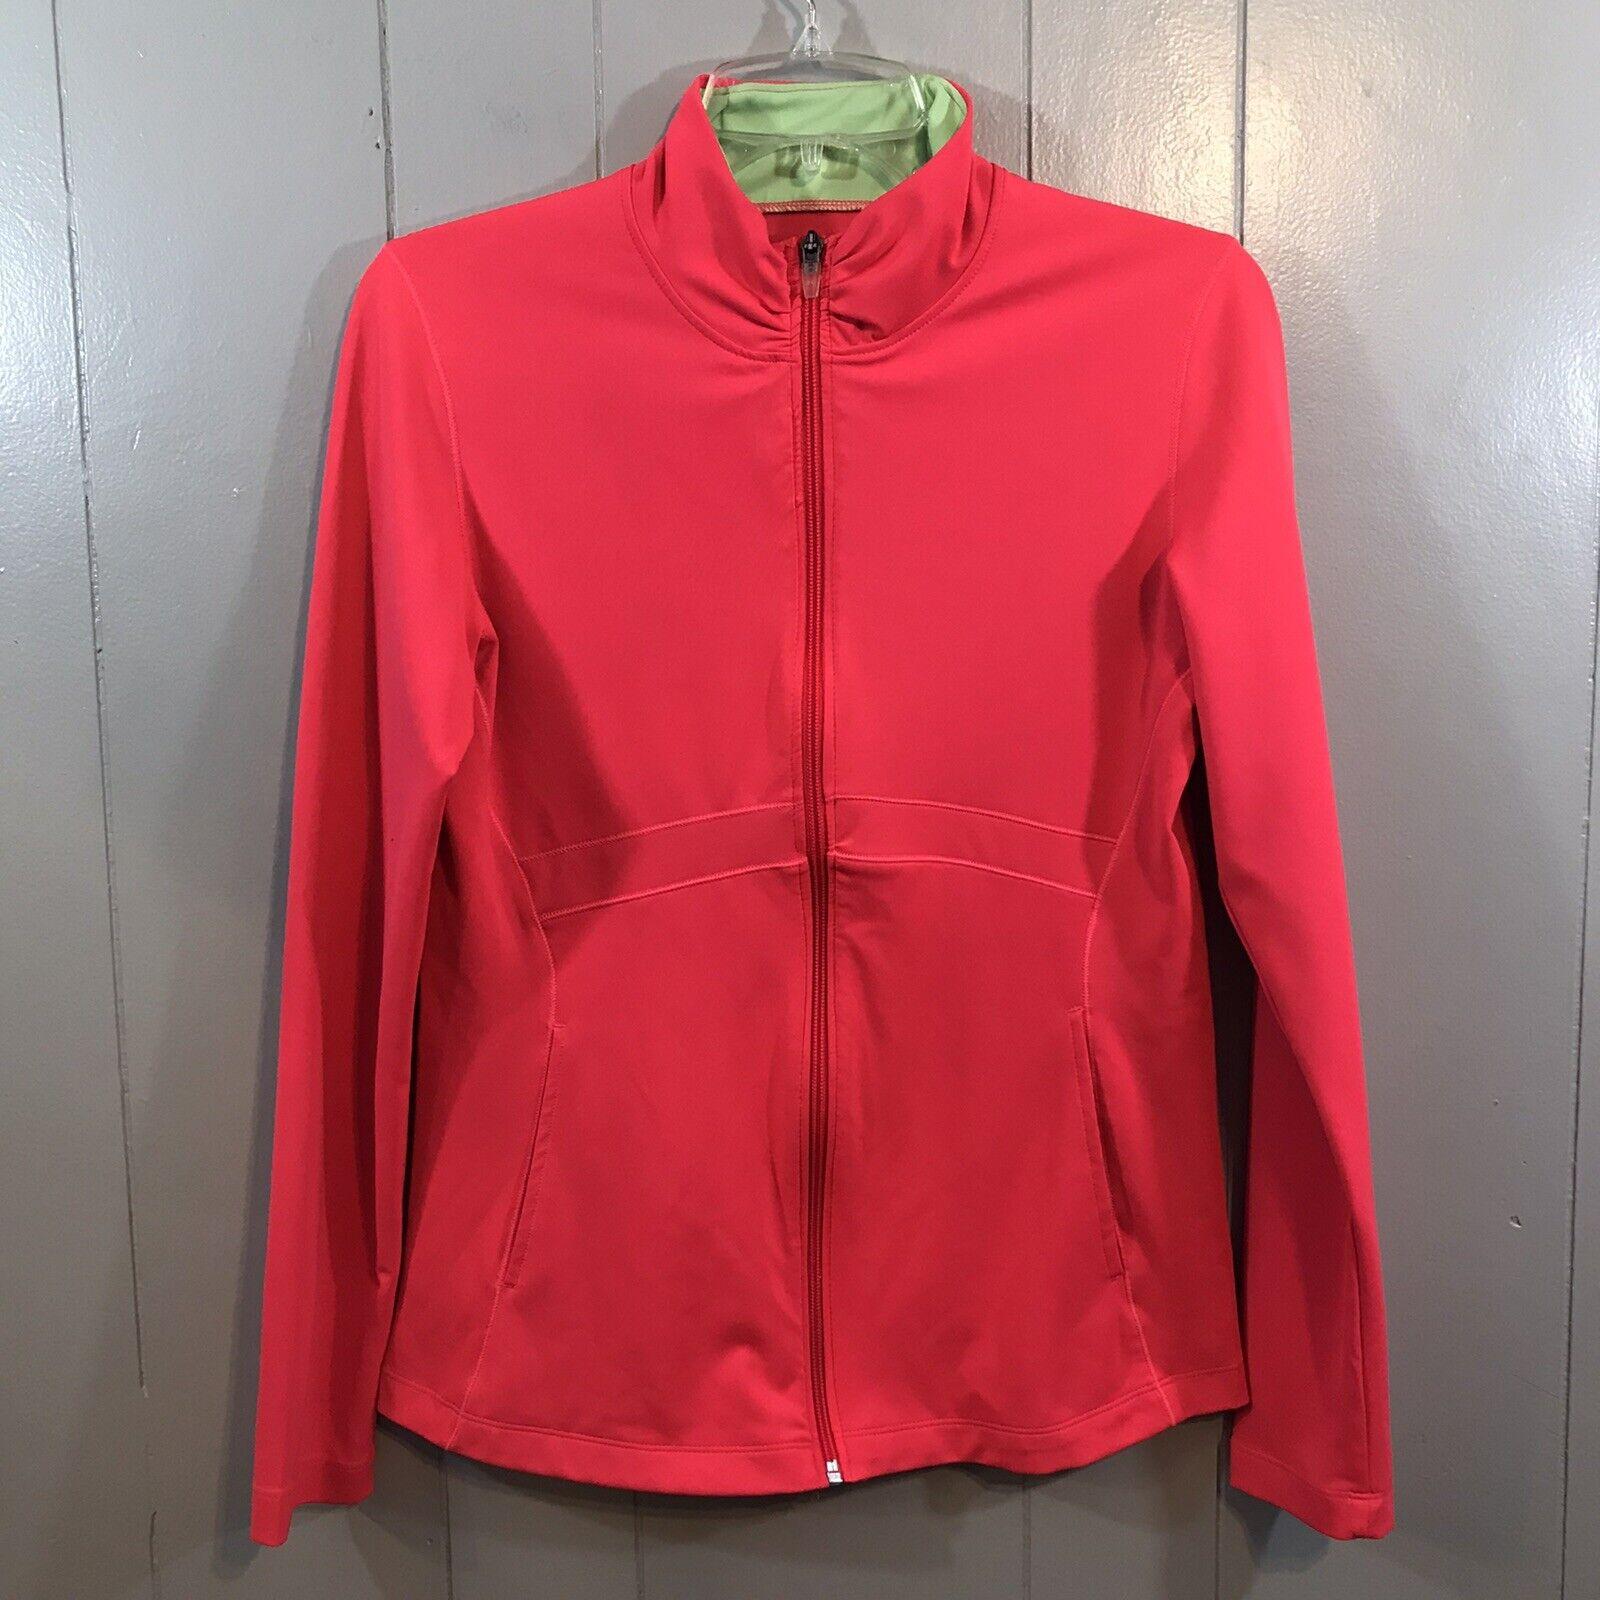 New Balance Hot Pink Slim Fit Full Zip Mock Neck Pockets Active Wear Top Medium